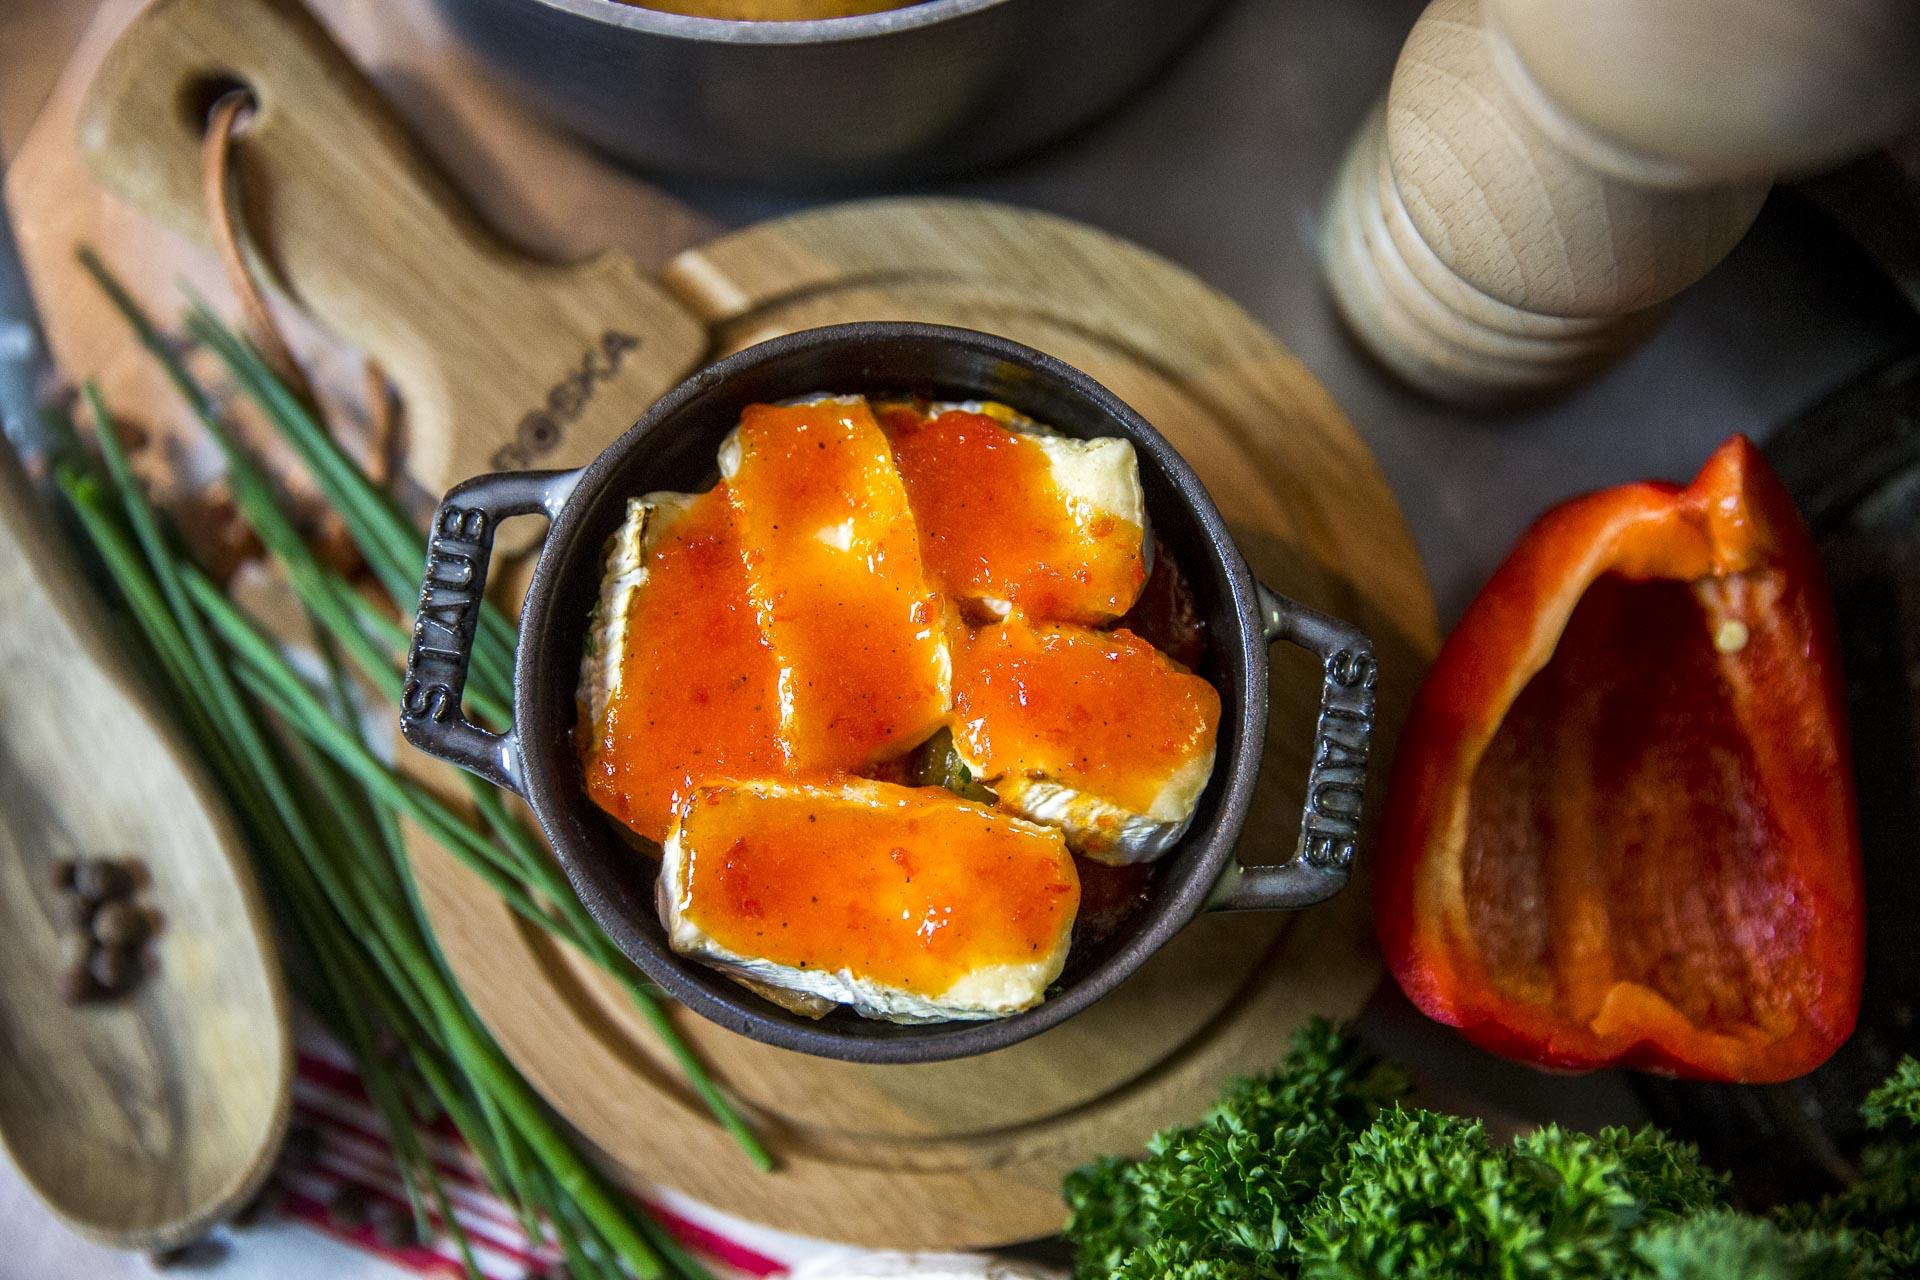 Pommes grenaille aux herbes gratinées au camembert©stephaneleroy-E61R4580.jpg